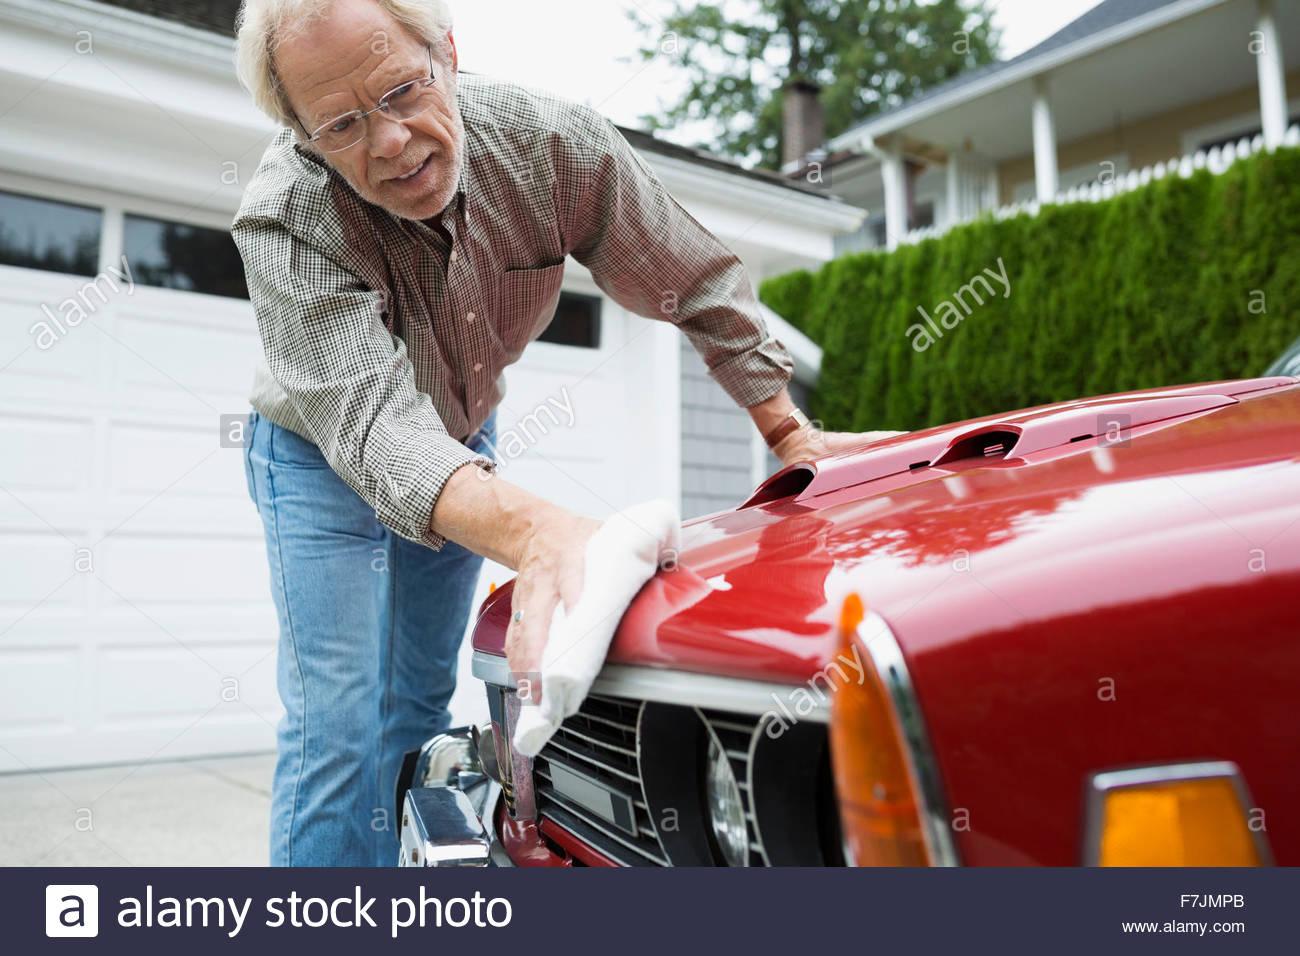 Senior man waxing classic car in driveway - Stock Image